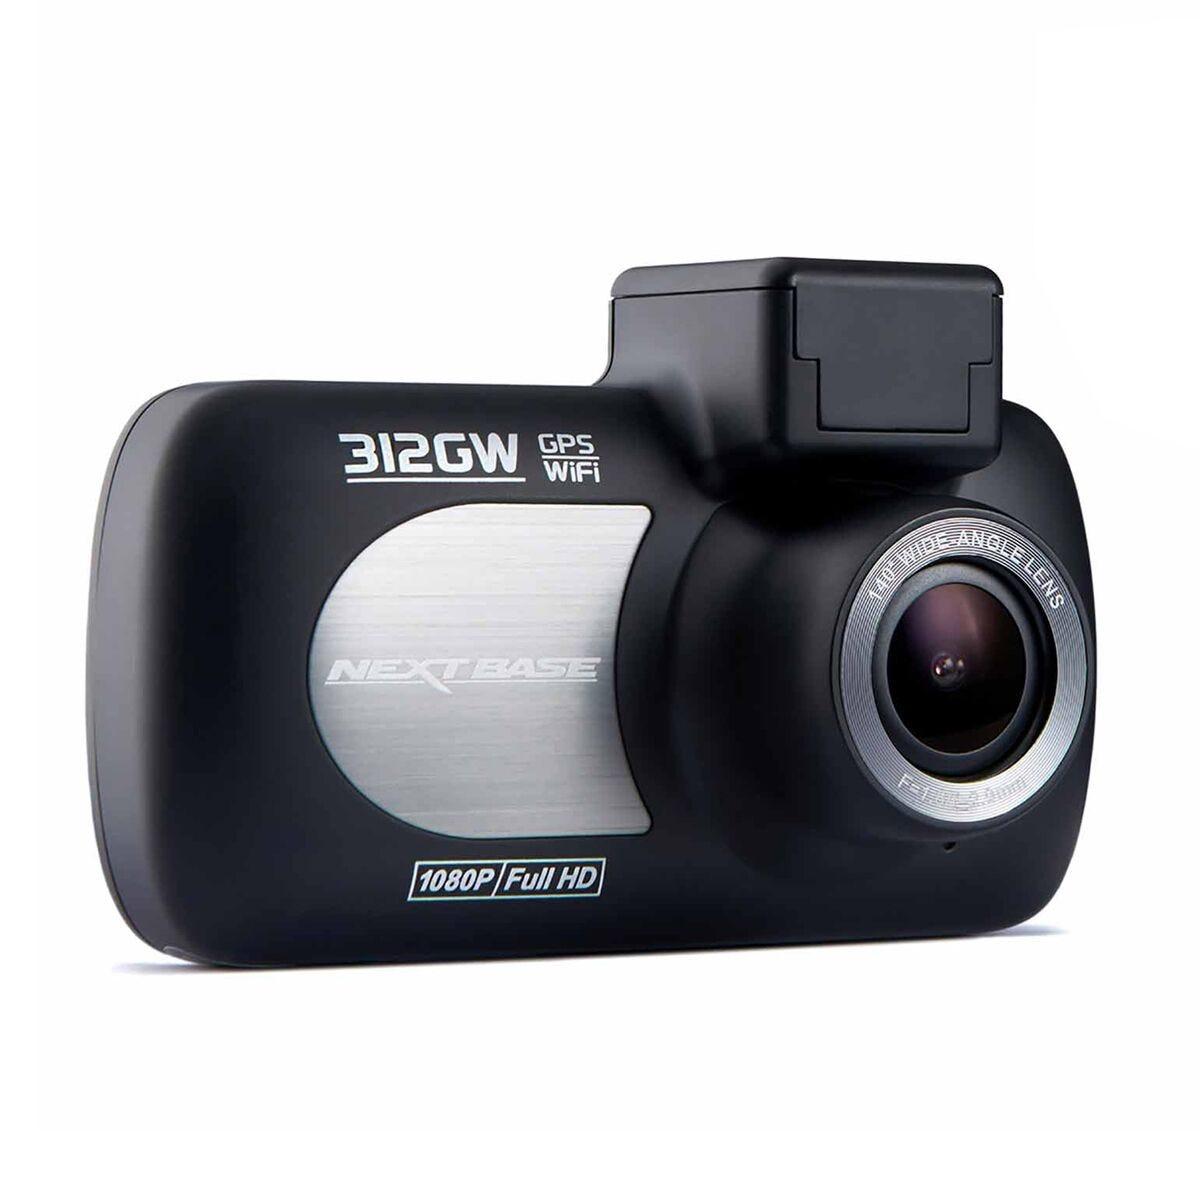 Nextbase 312GW Deluxe Dash Camera Built in WiFi 1080p HD